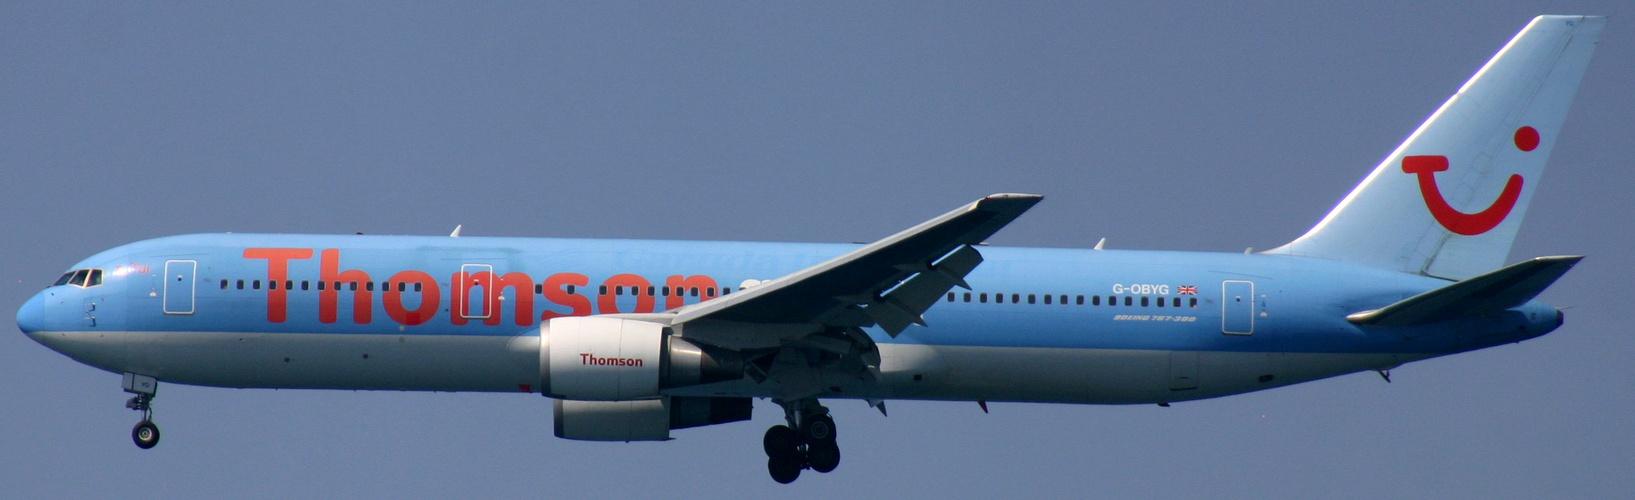 Thomson 763